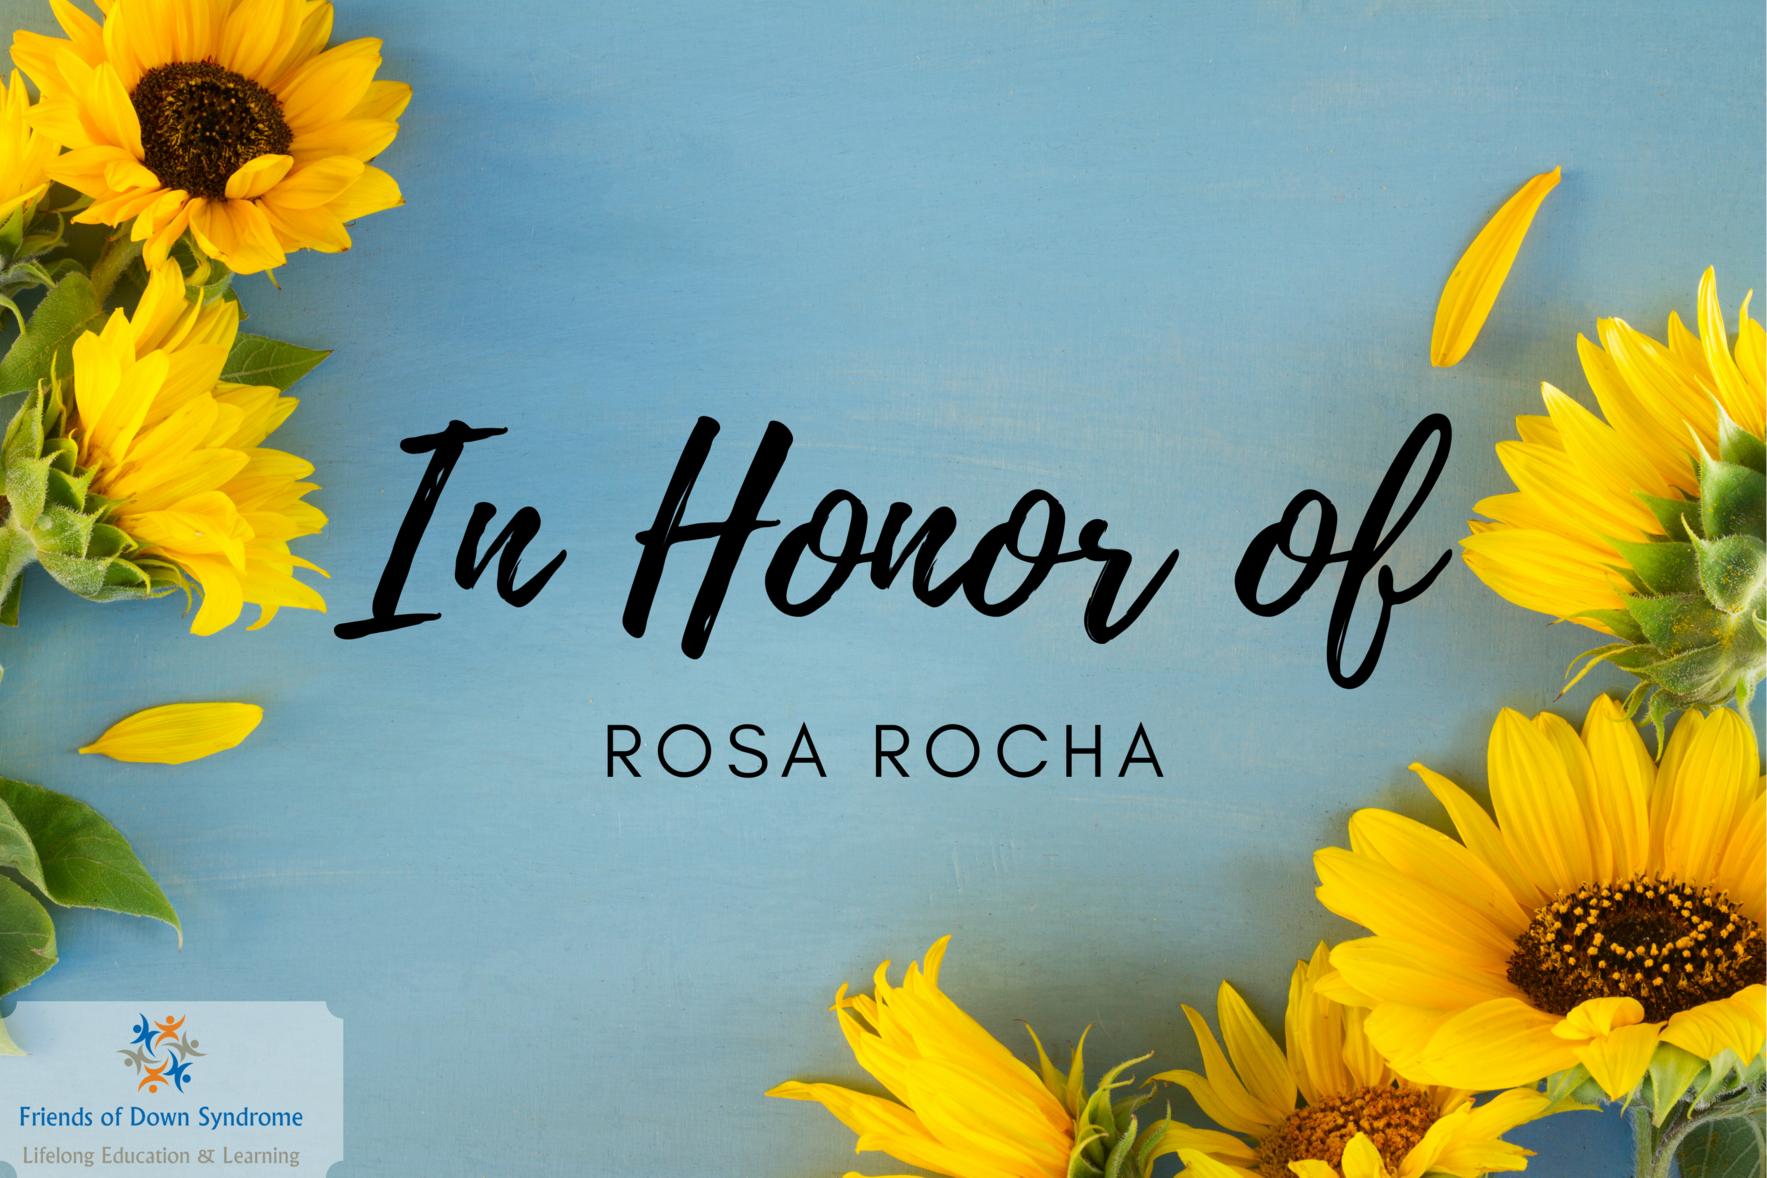 In Honor of Rosa Rocha image